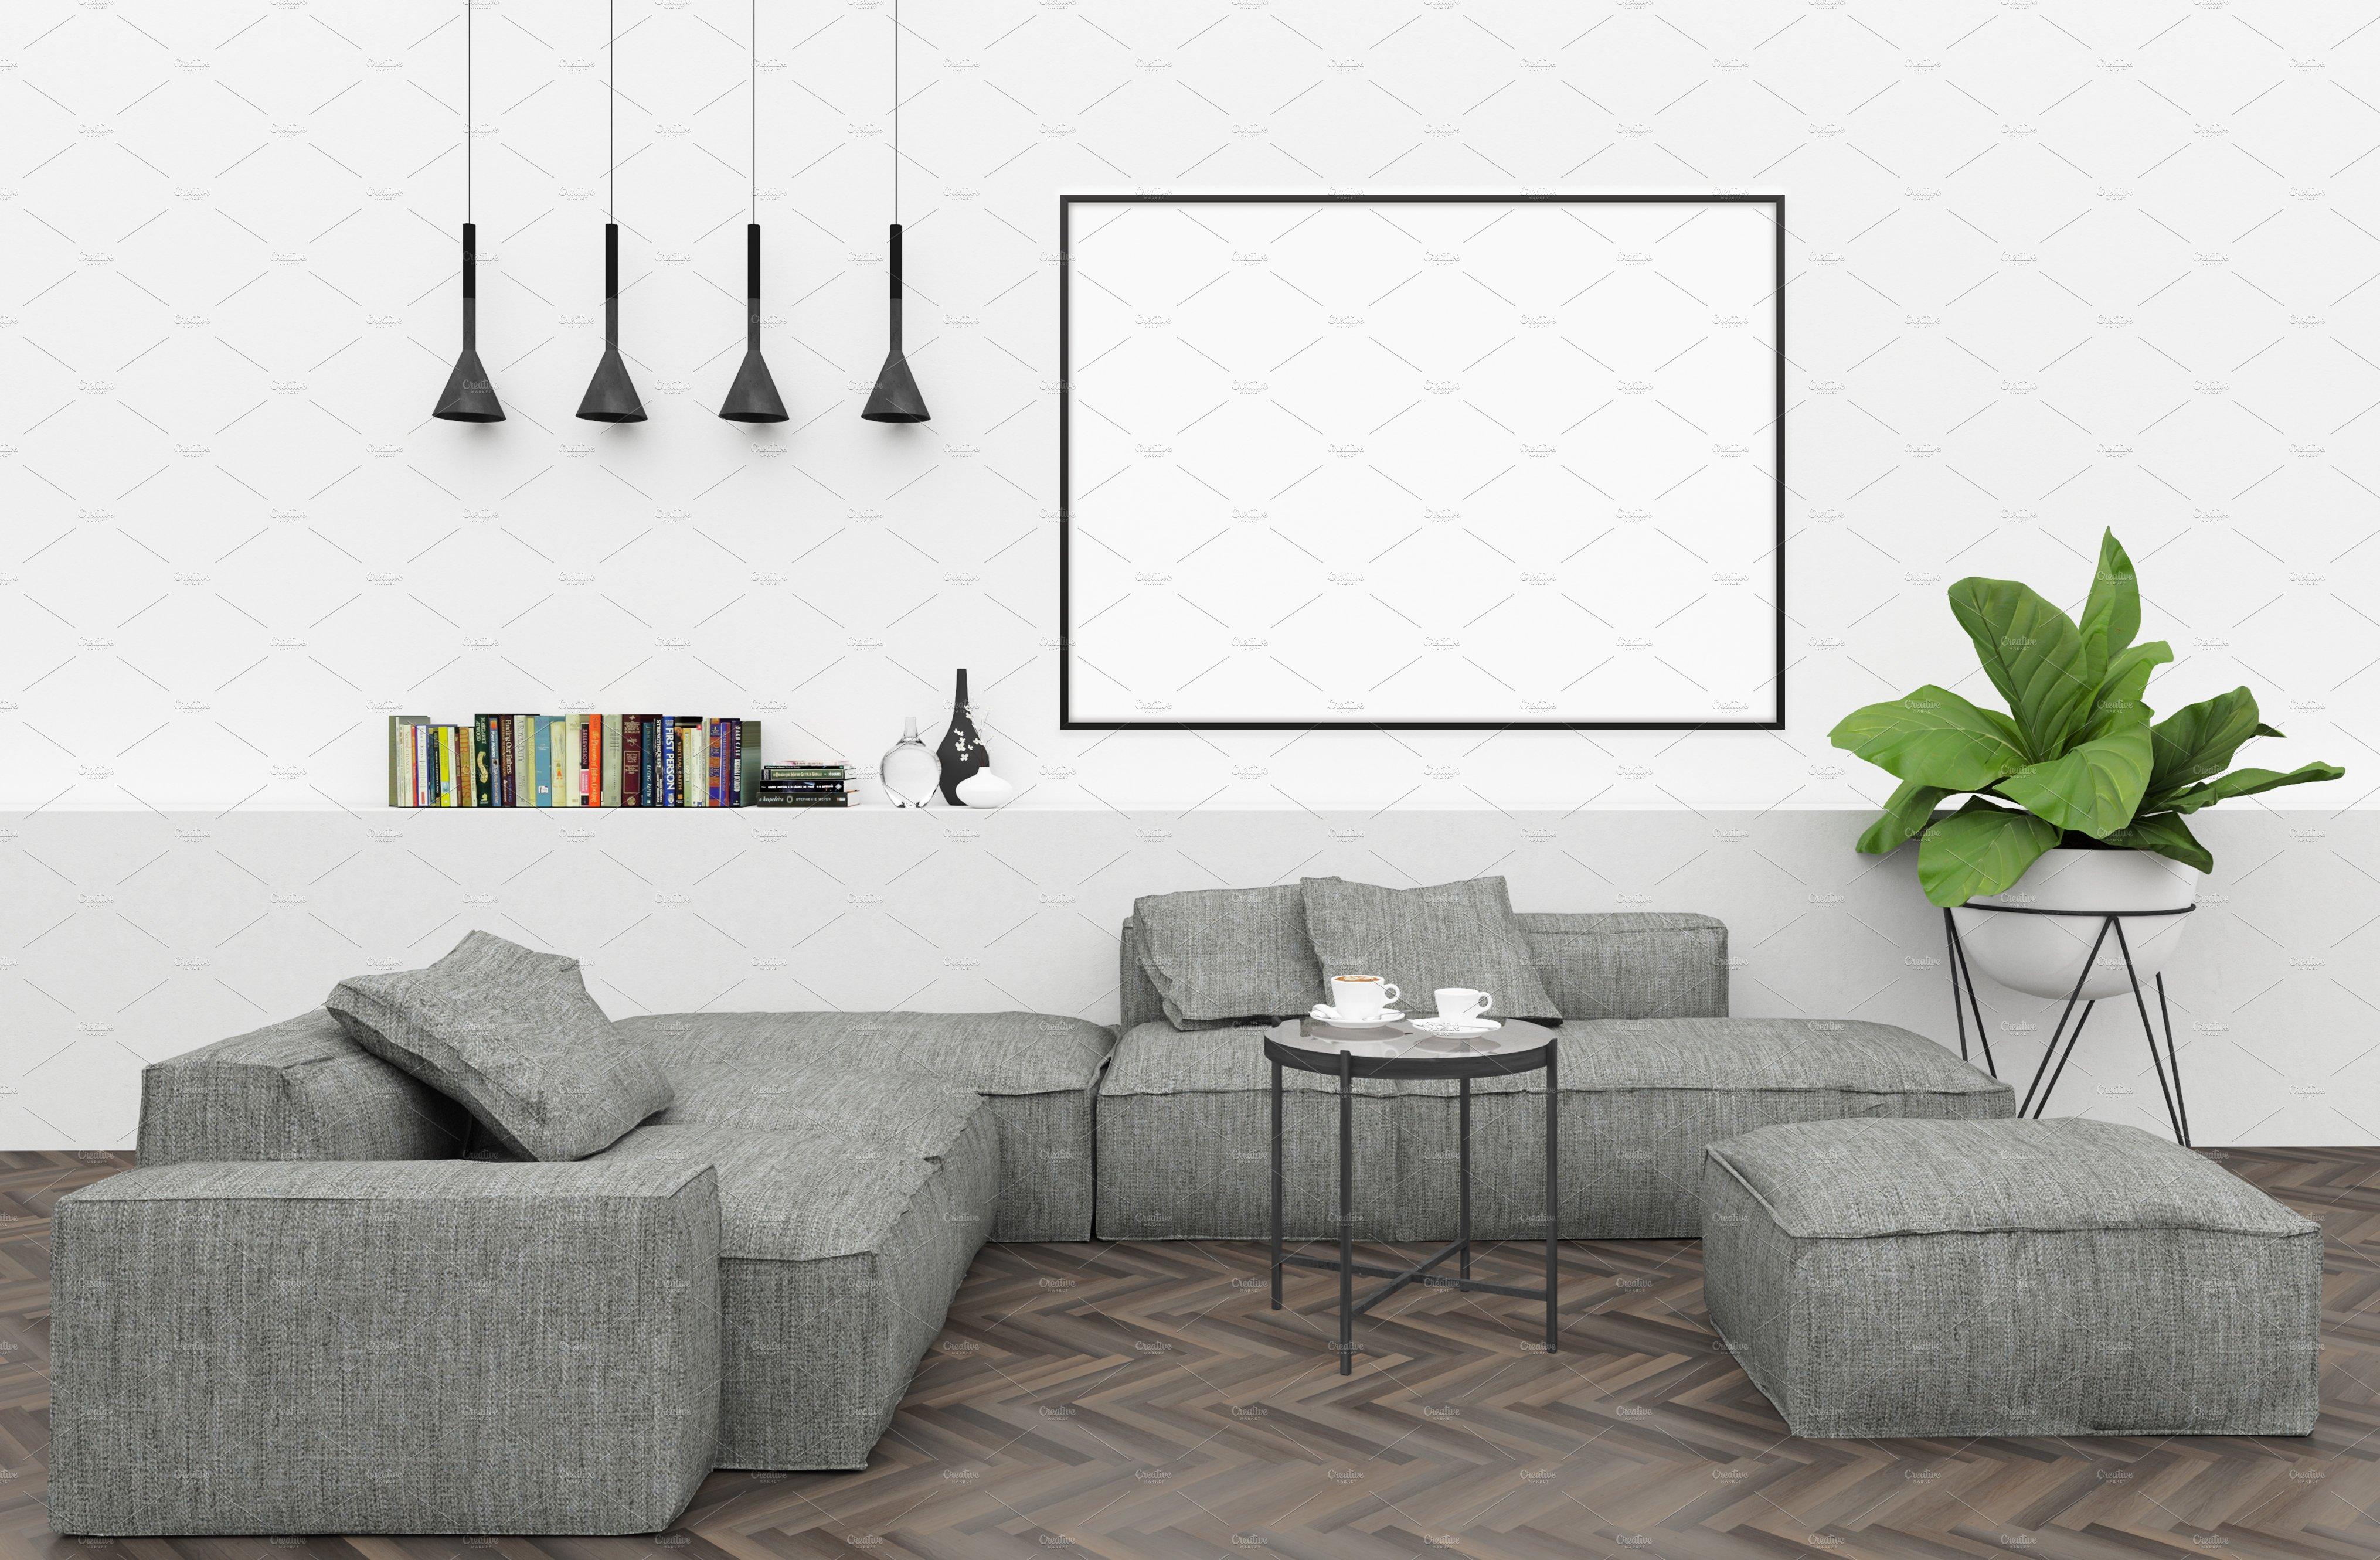 Blank wall mockup interior mockup product mockups for Four blank walls